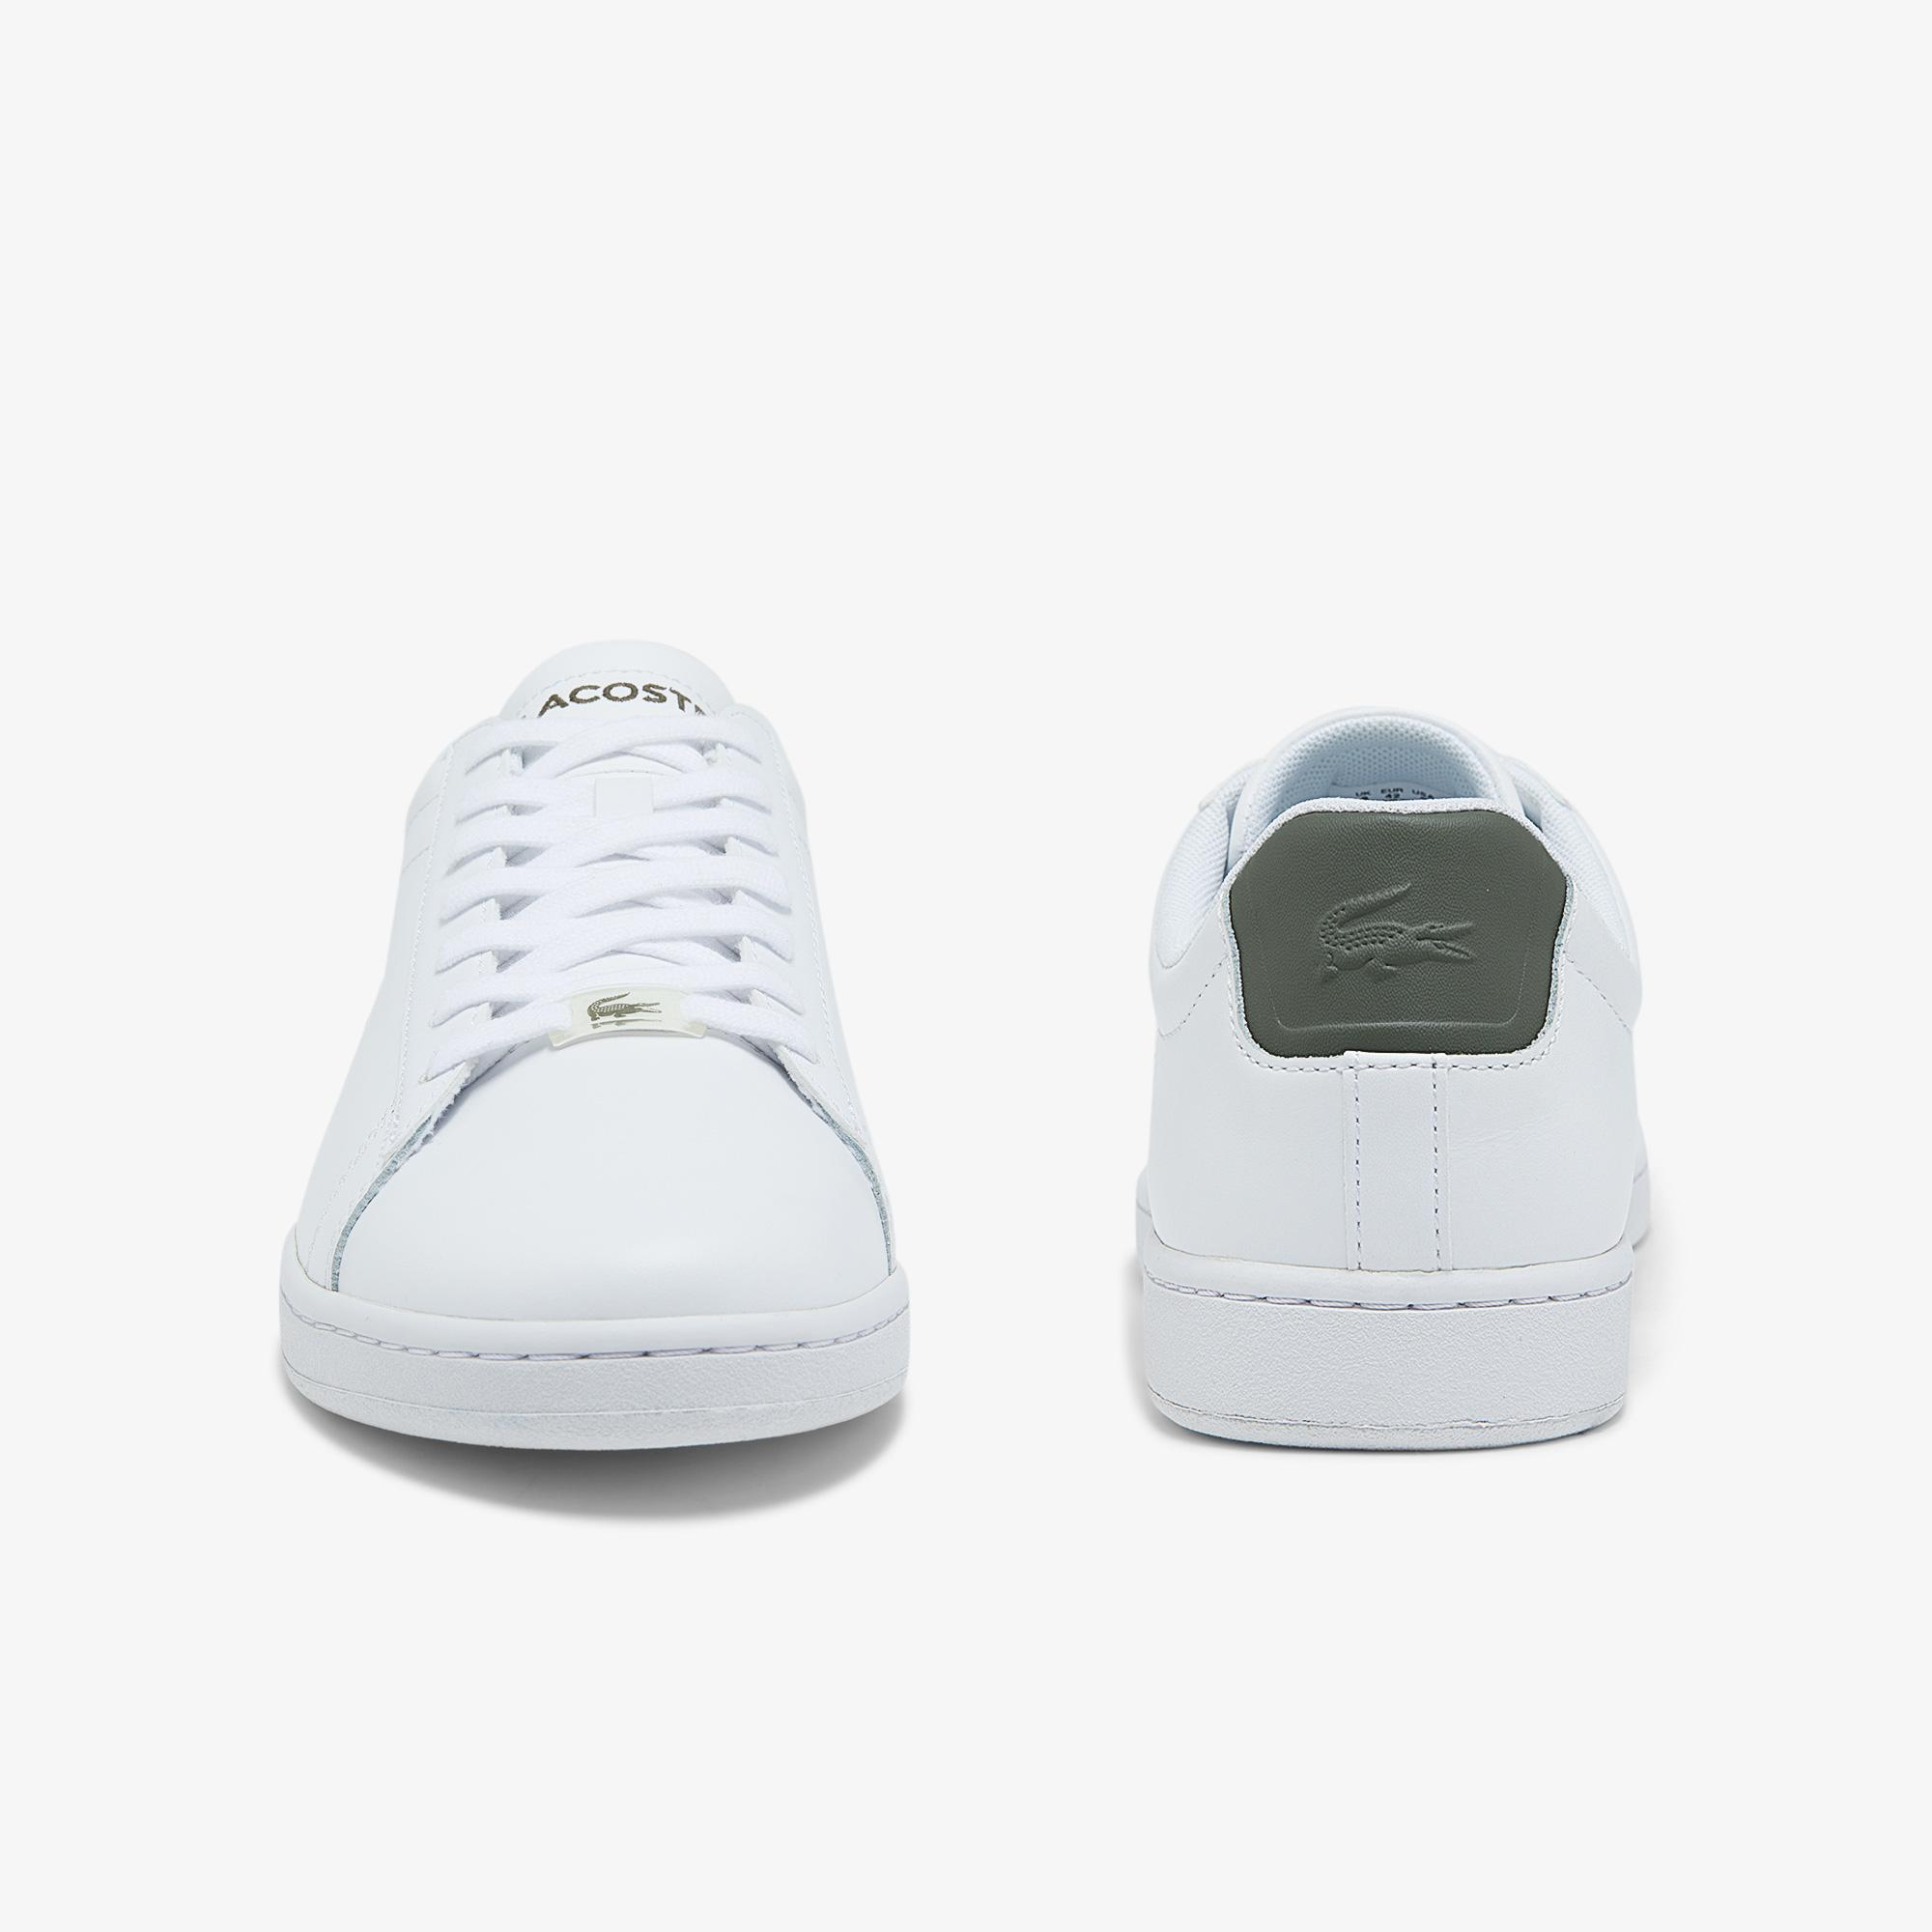 Lacoste Męskie sneakersy Carnaby Evo